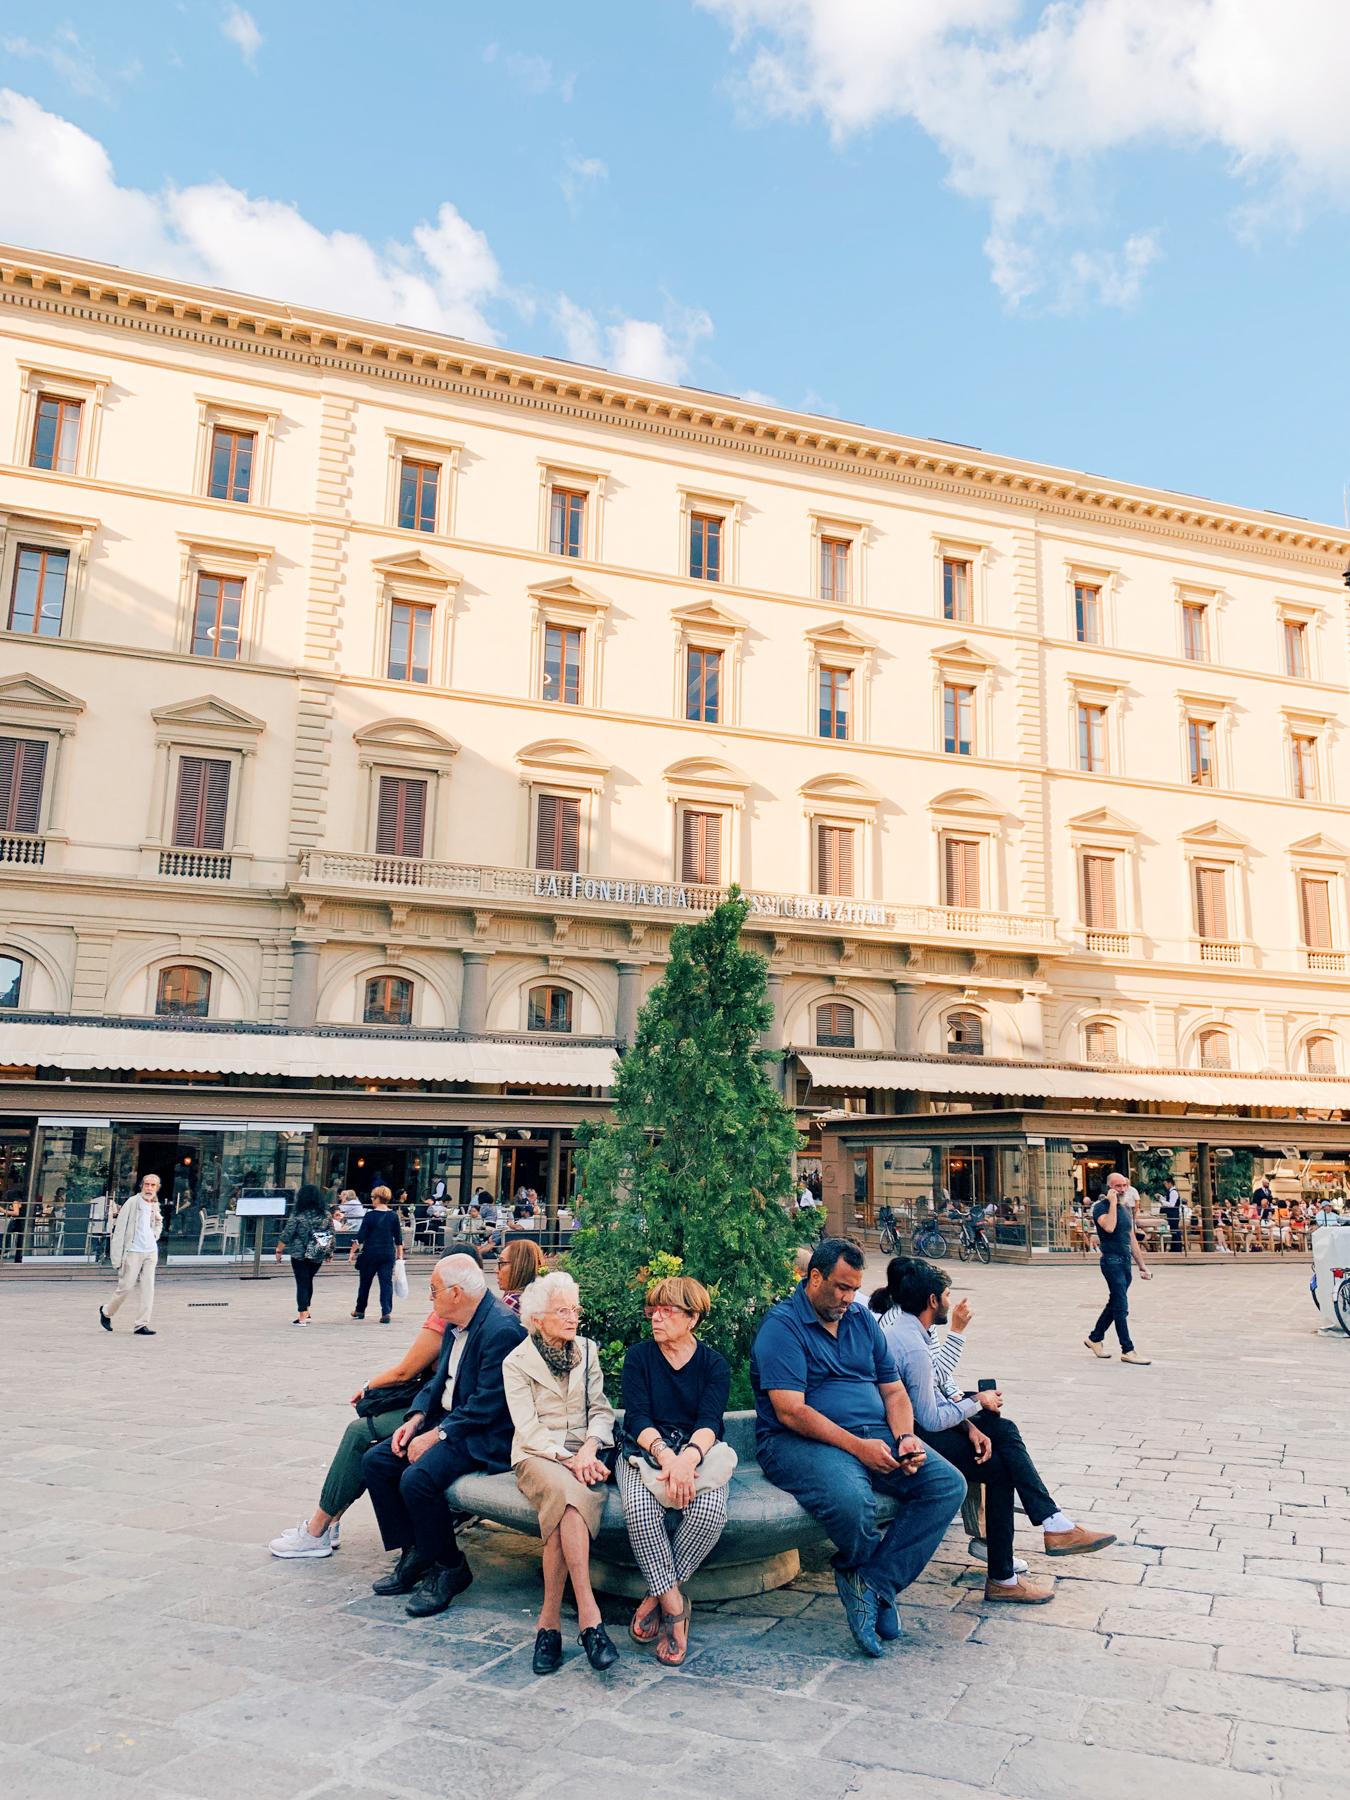 People relaxing in Piazza della Repubblica